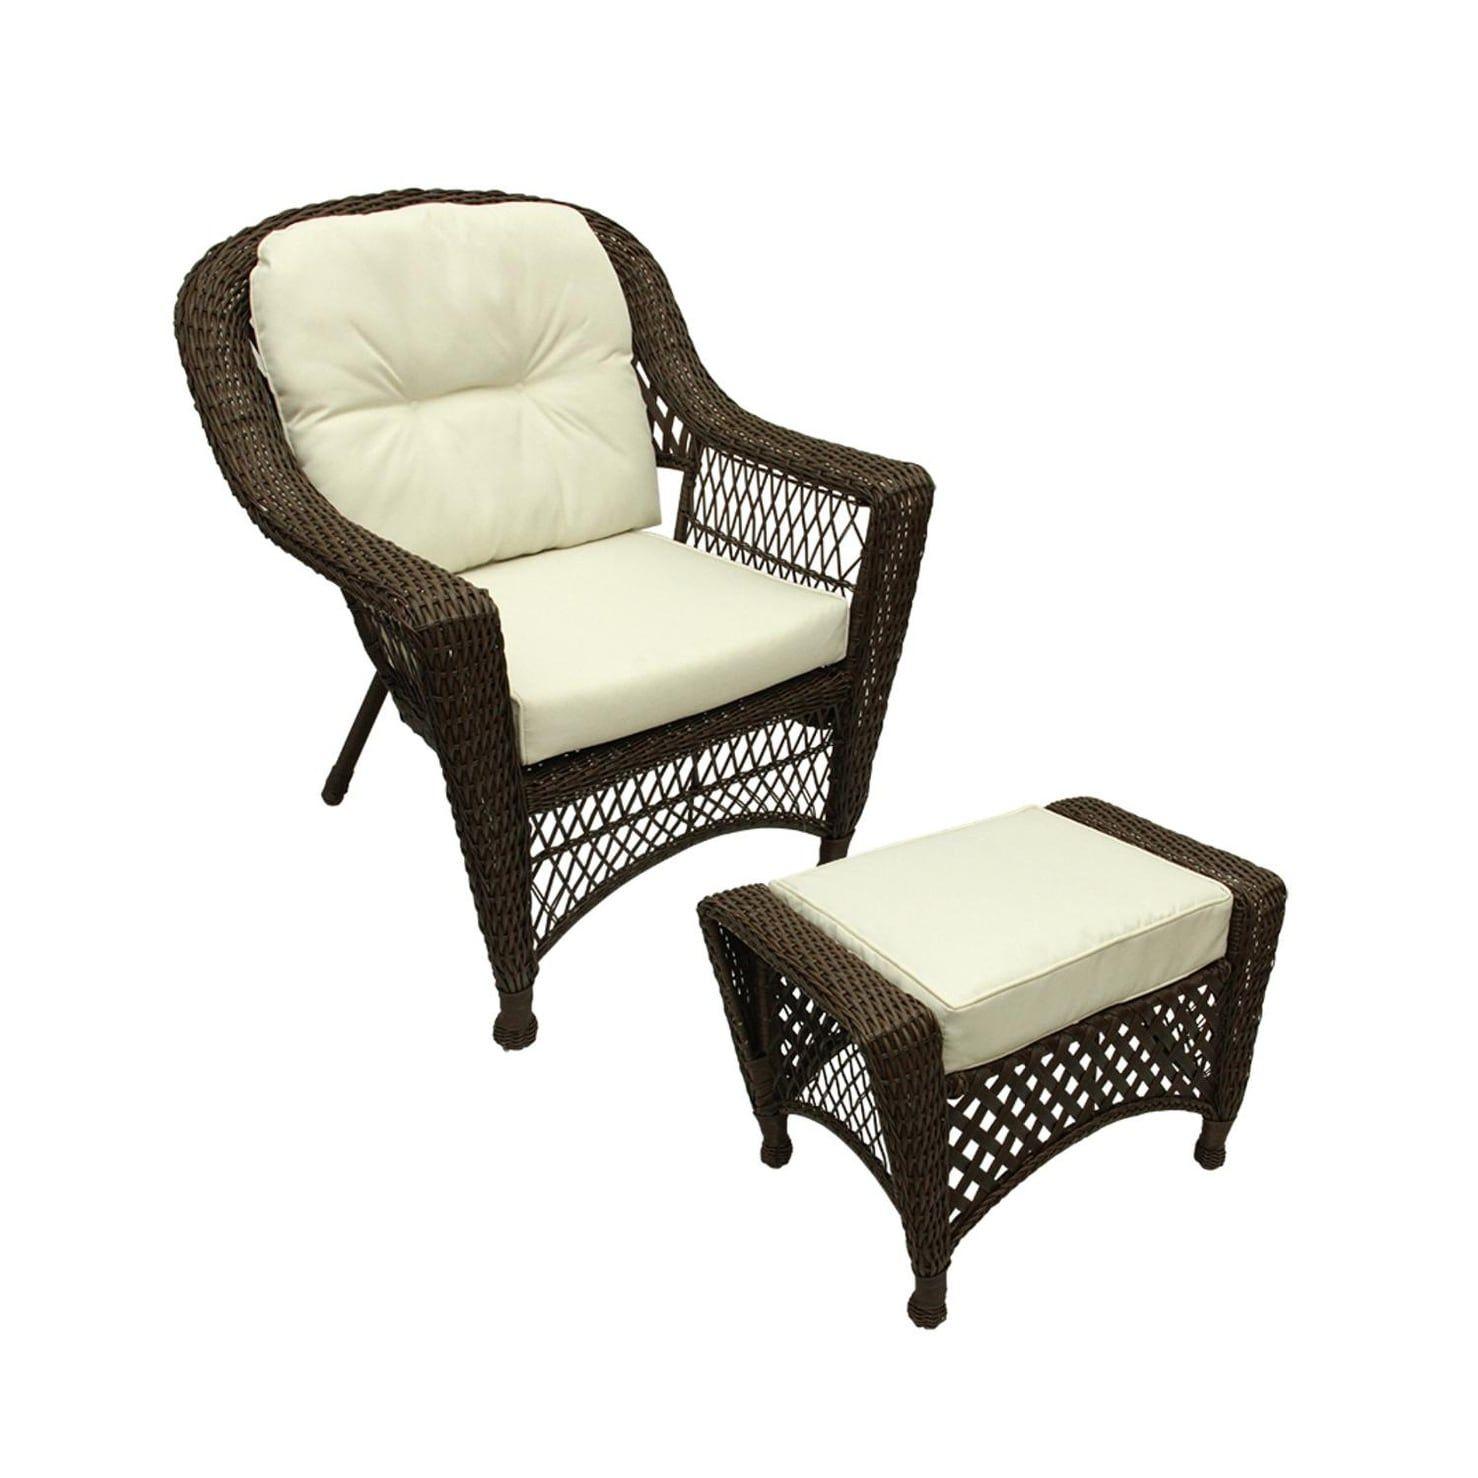 2 Pc Somerset Dark Brown Resin Wicker Patio Chair & Ottoman